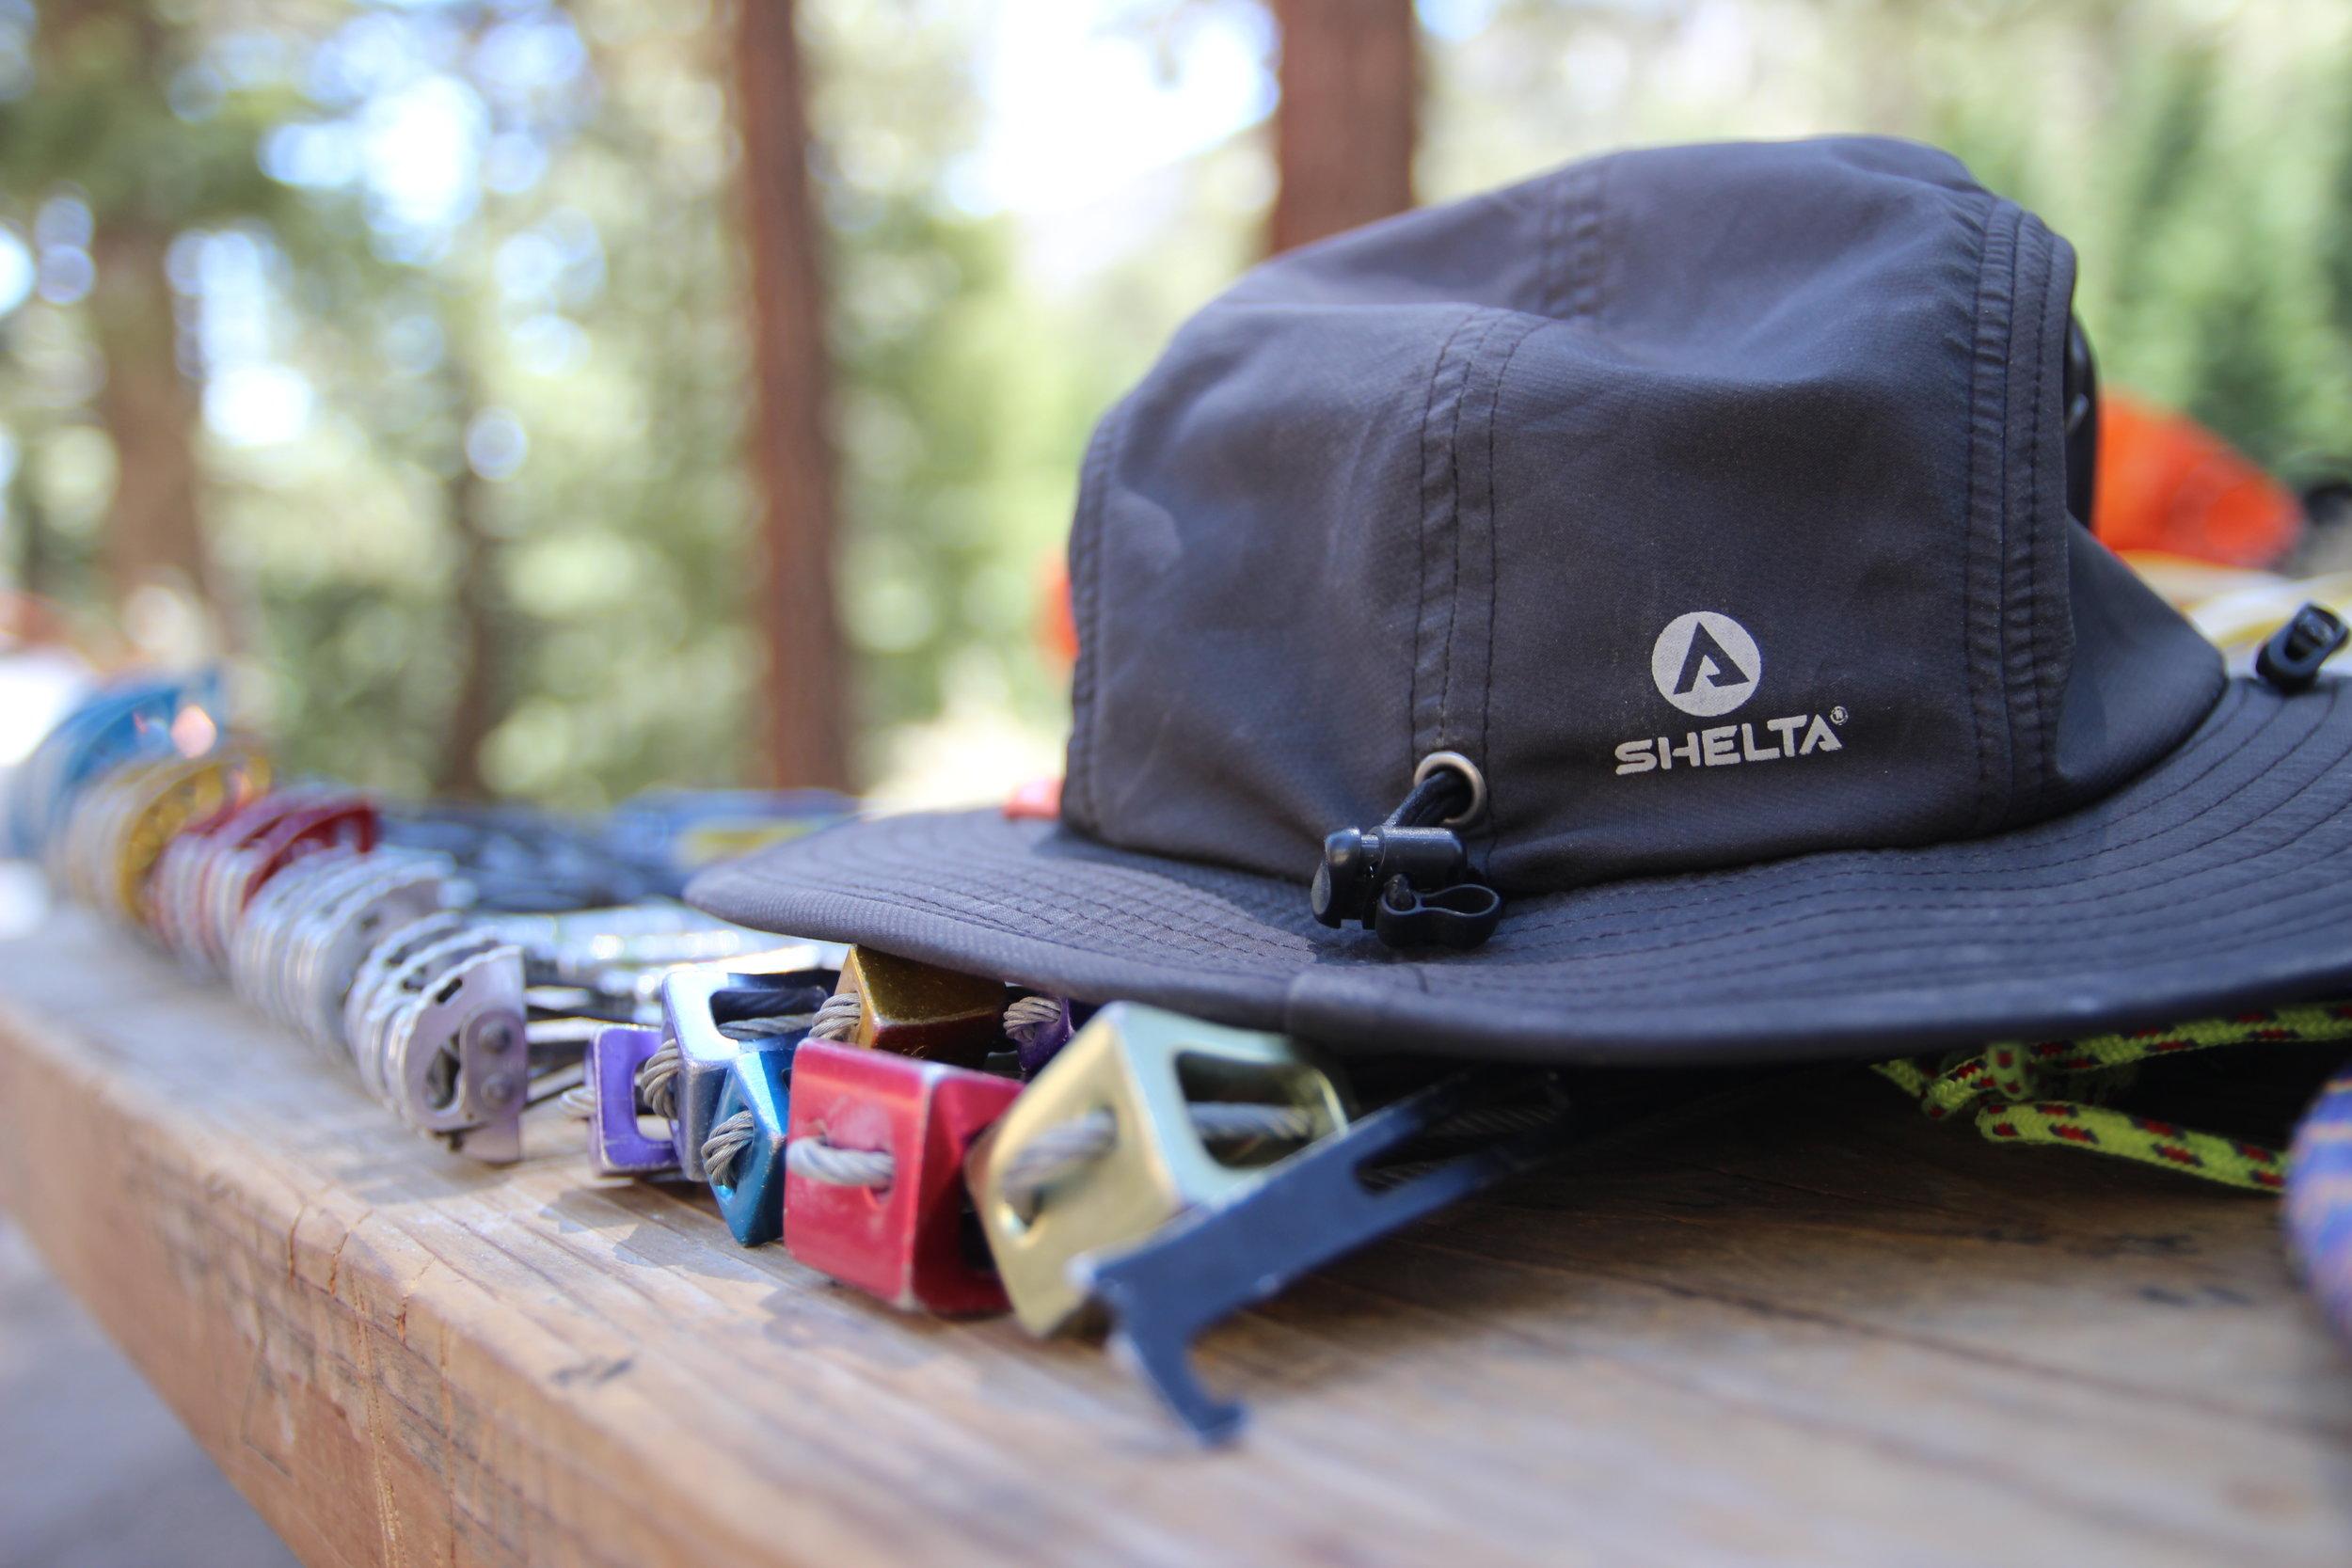 Shelta Hats & Golden State Guiding Partnership